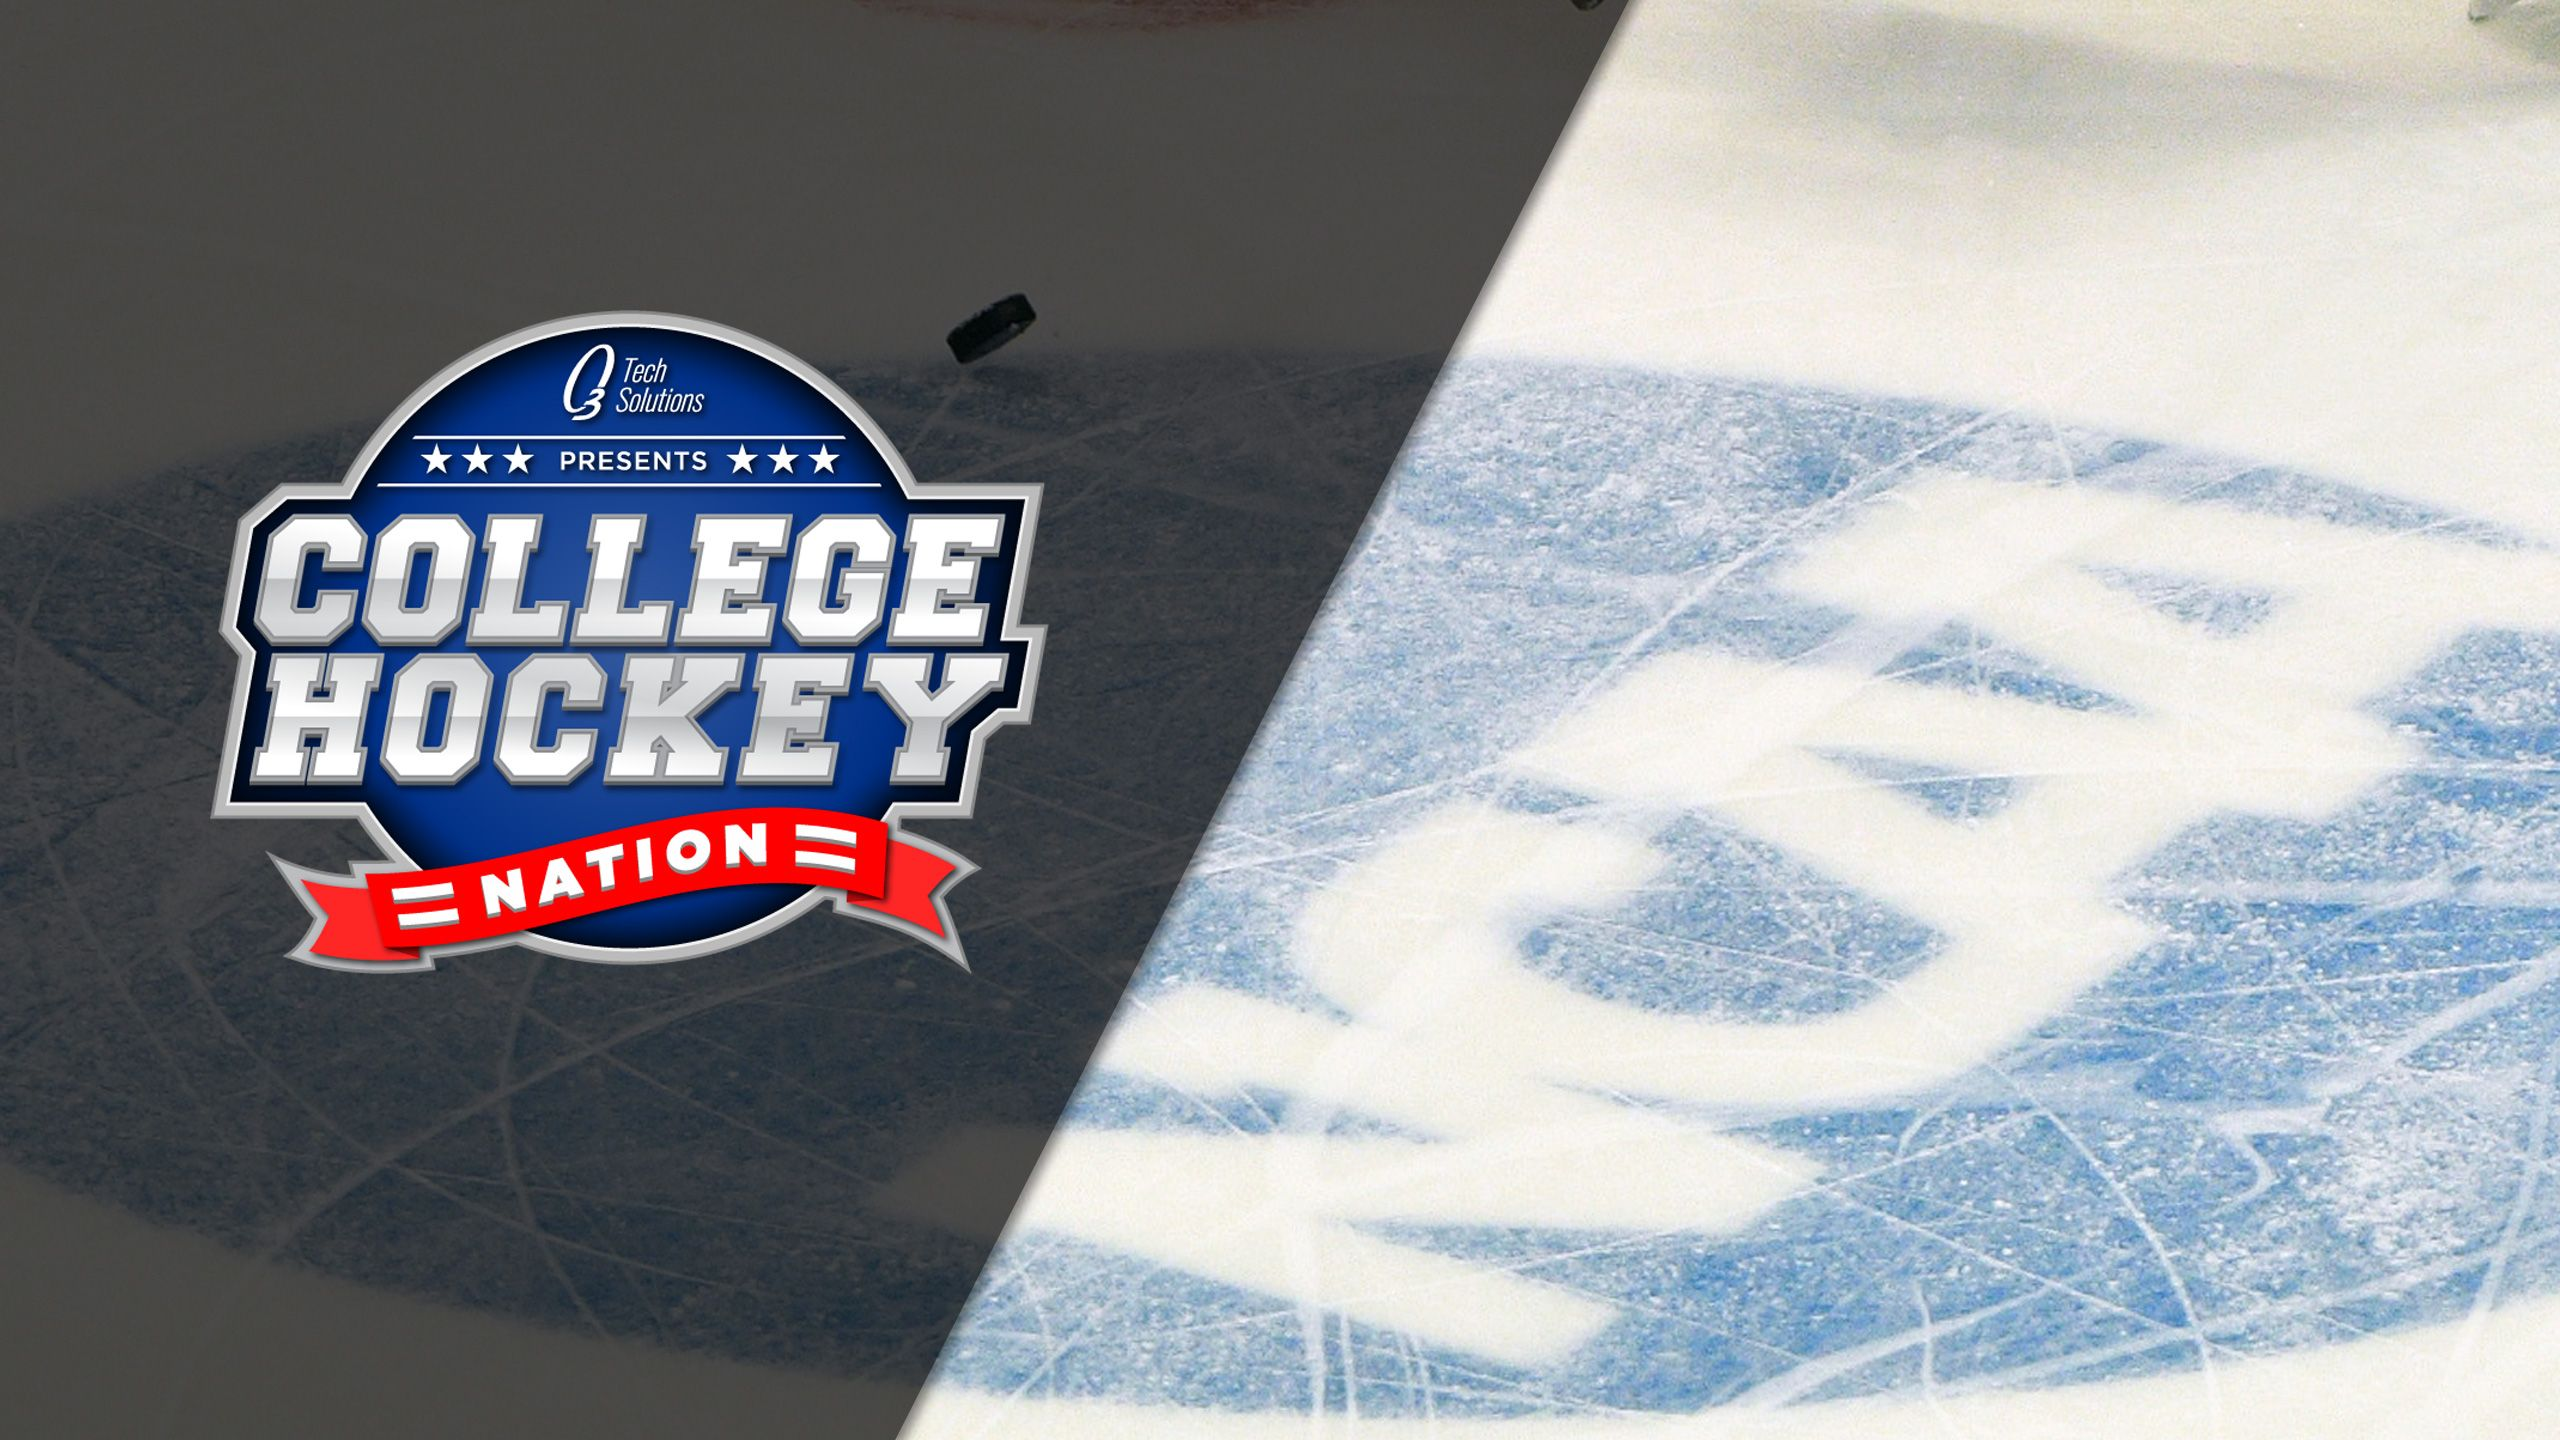 College Hockey Nation: Episode 8